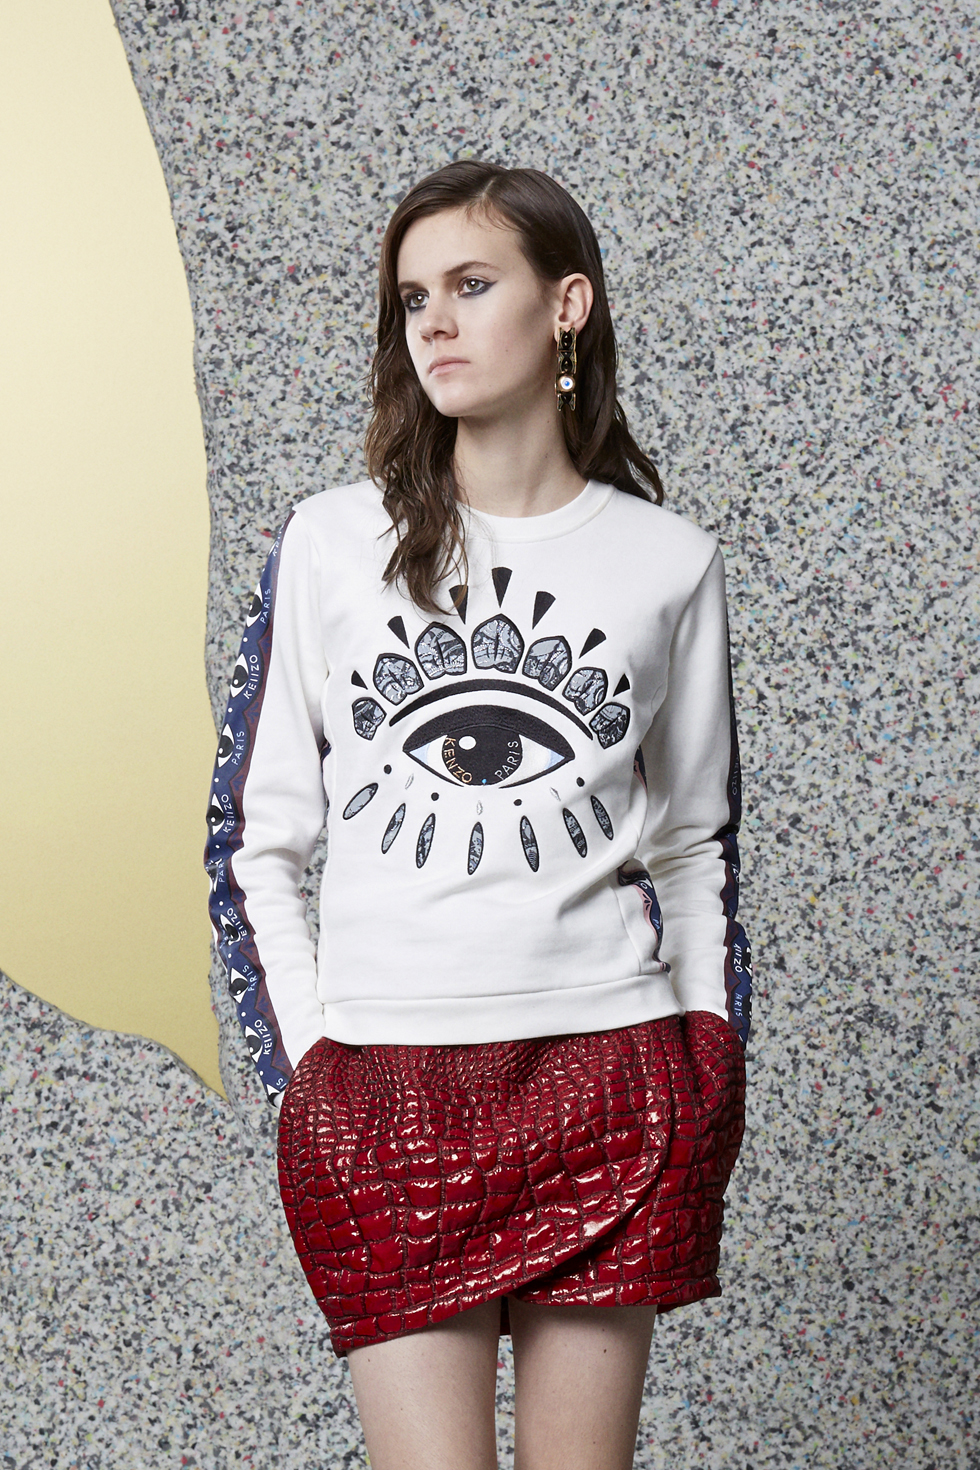 Sweatshirt Eye  Kenzo - Sweat-shirts & Pulls Kenzo Femme - E-Shop Kenzo   Kenzo.com